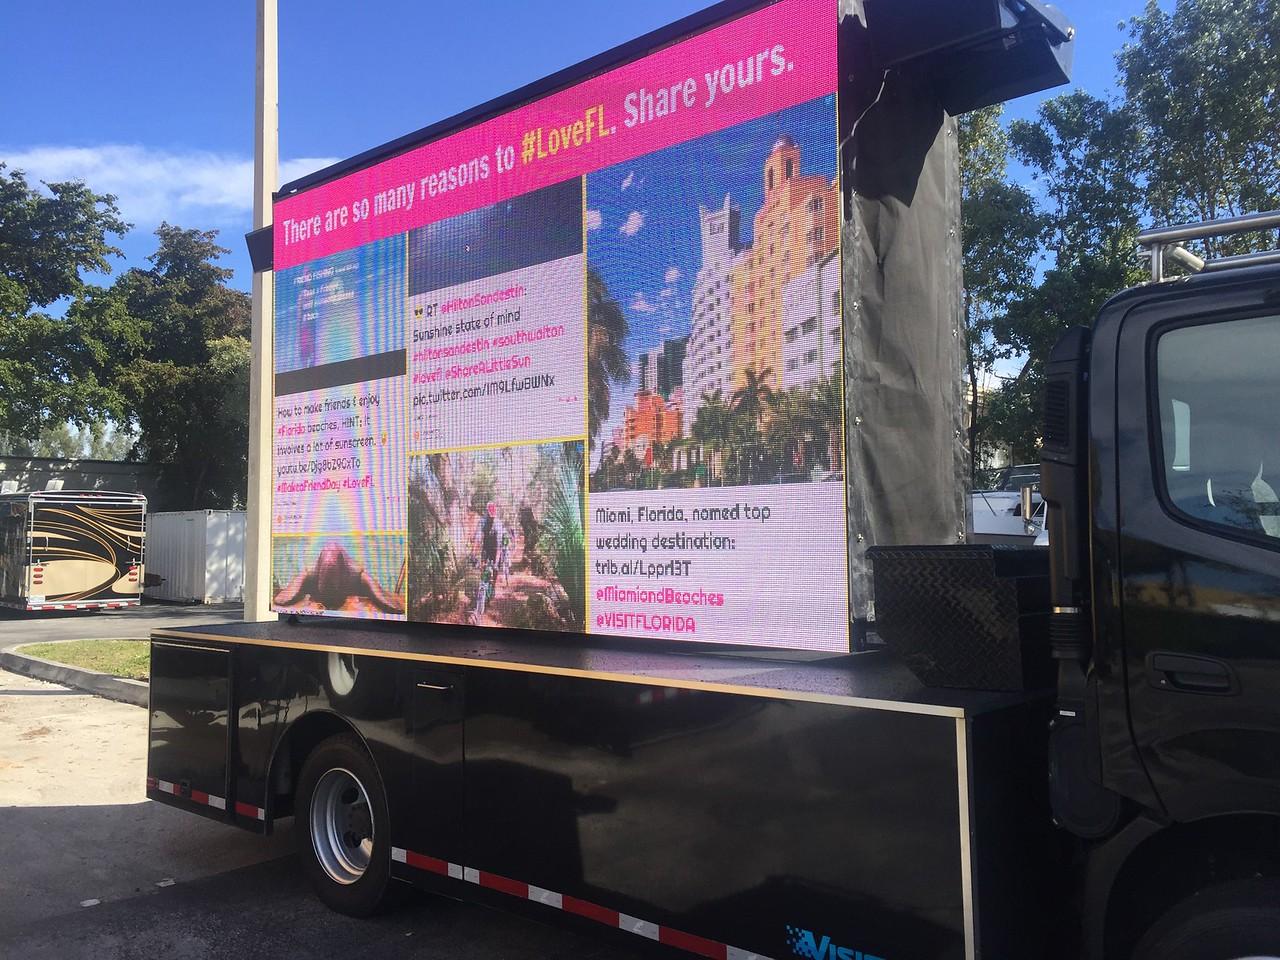 #LOVEFL Visit Florida Outdoor Mobile Screen Display sooh